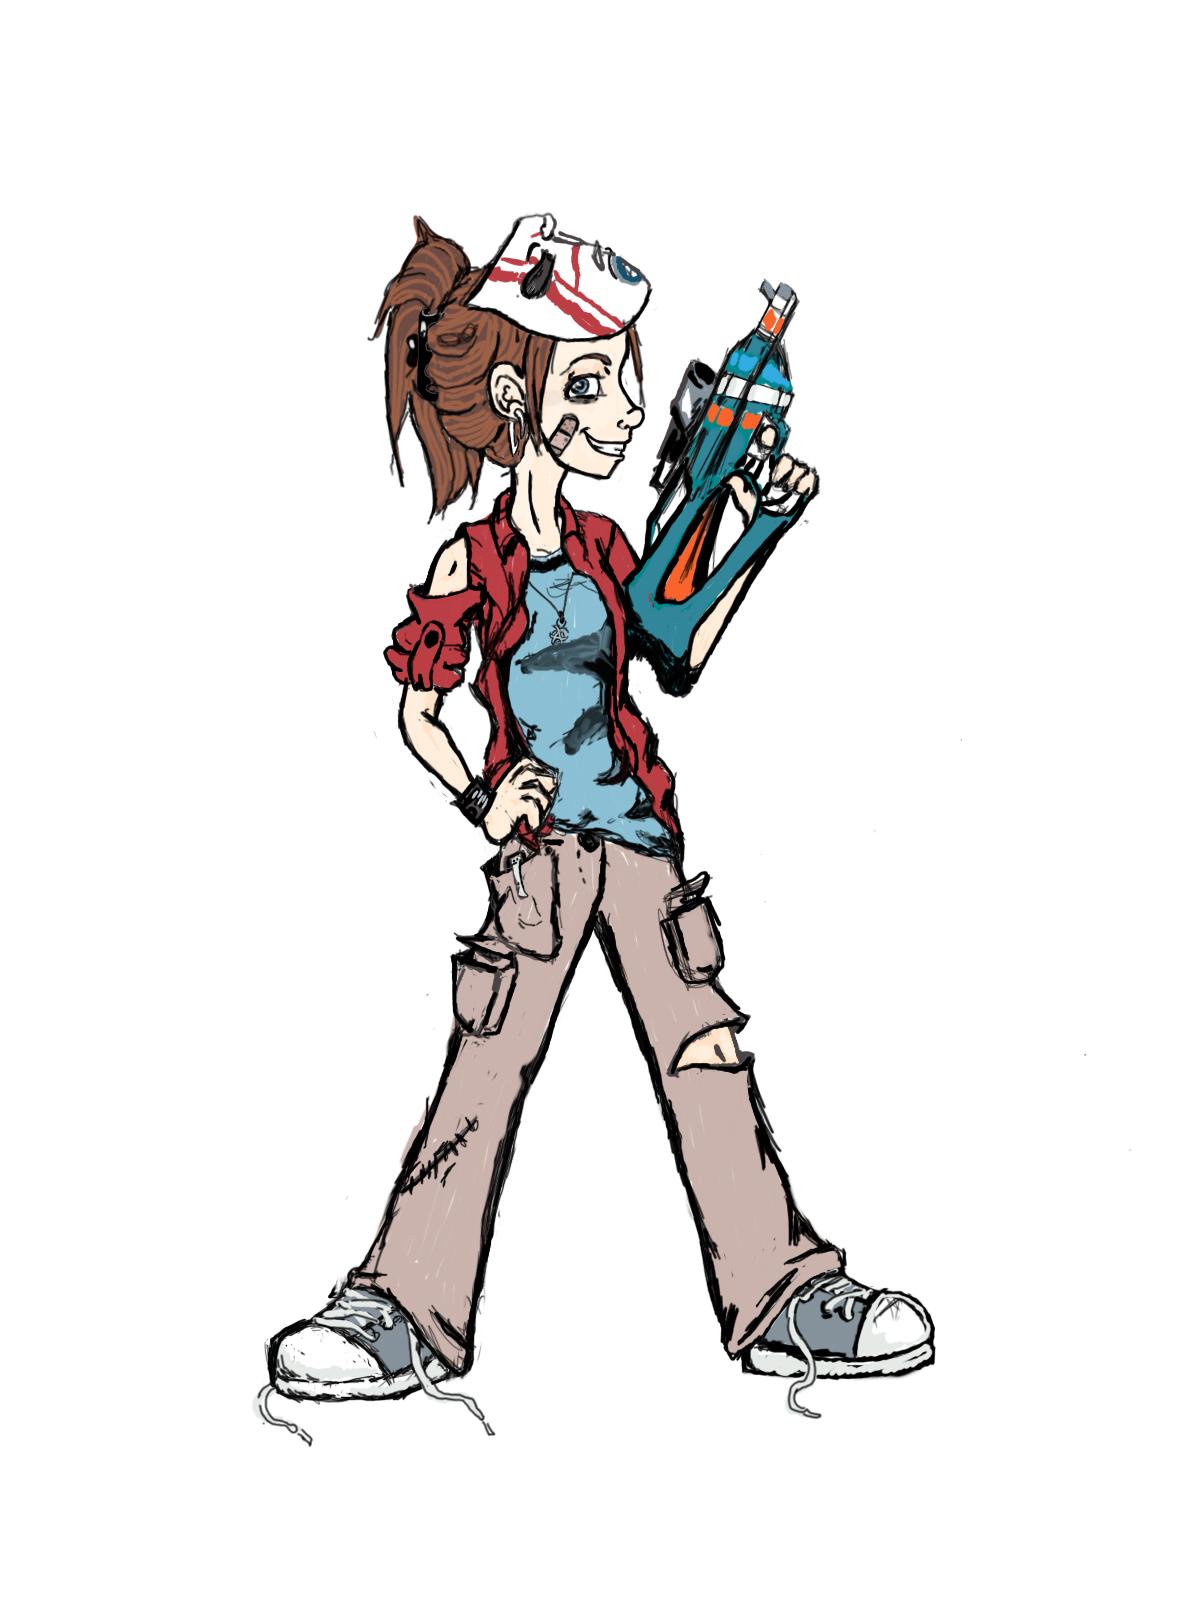 Short-Change-Hero's Profile Picture